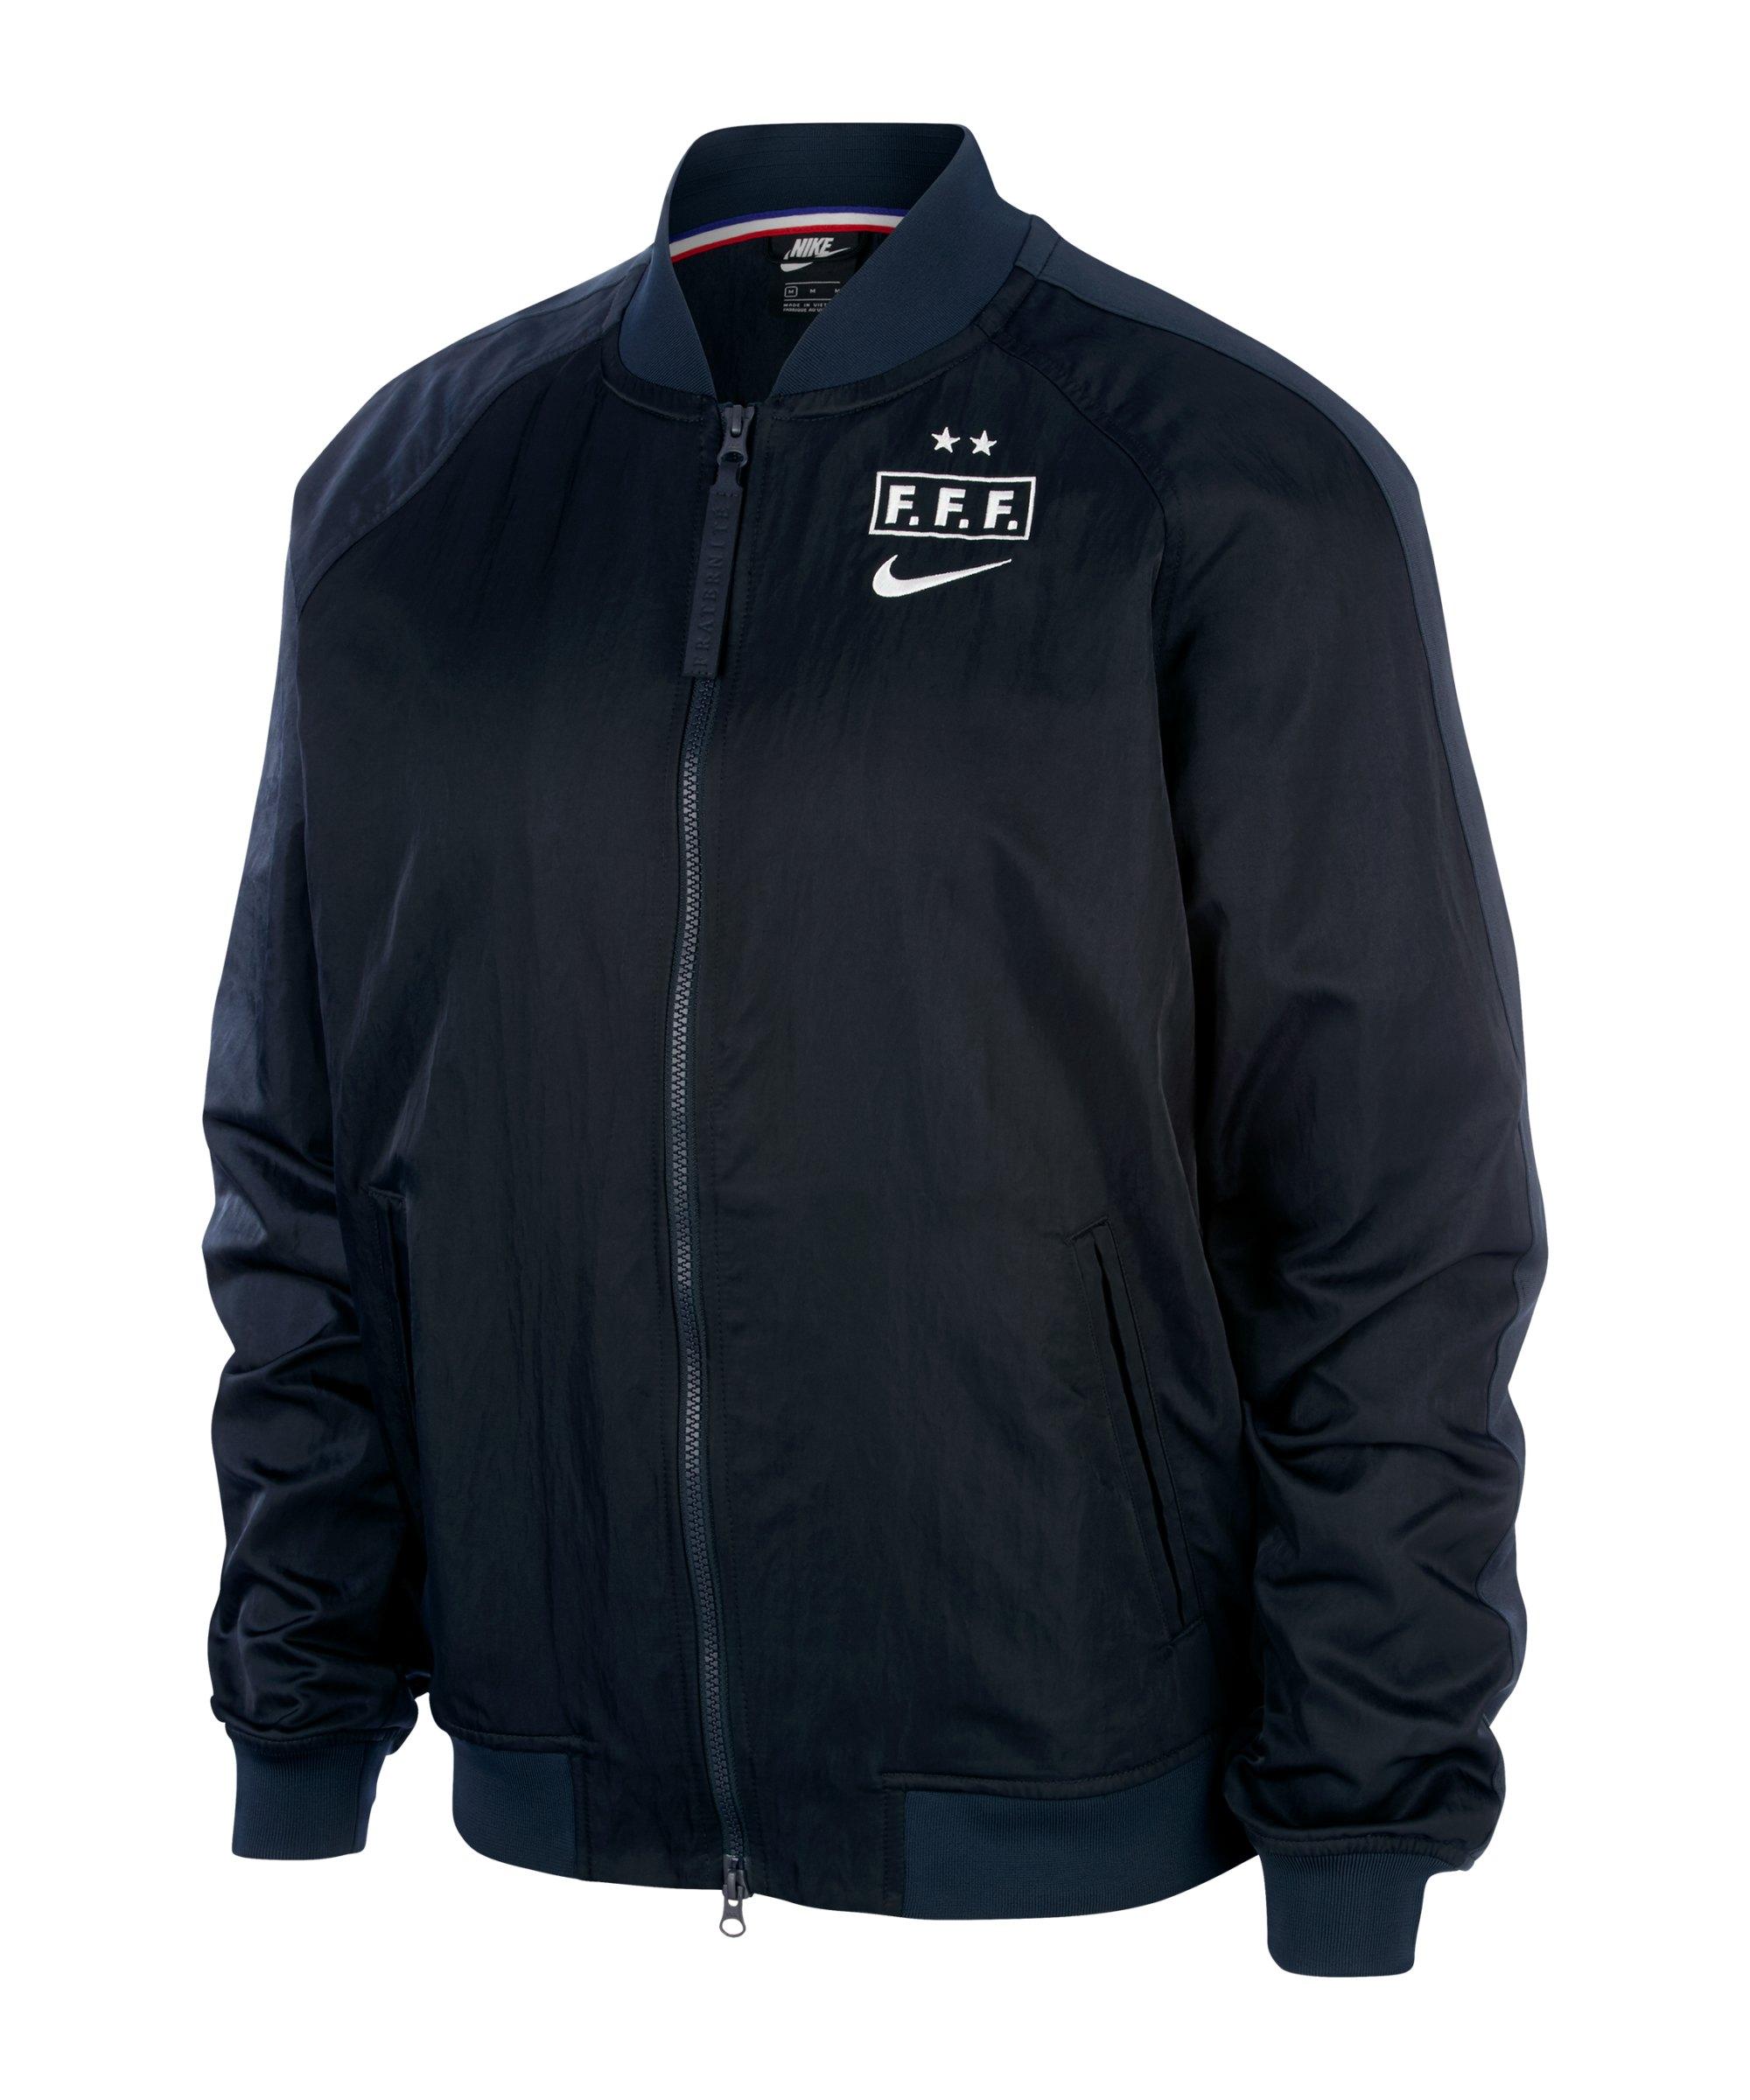 Nike Frankreich Souvenir Jacket Jacke F475 - grau